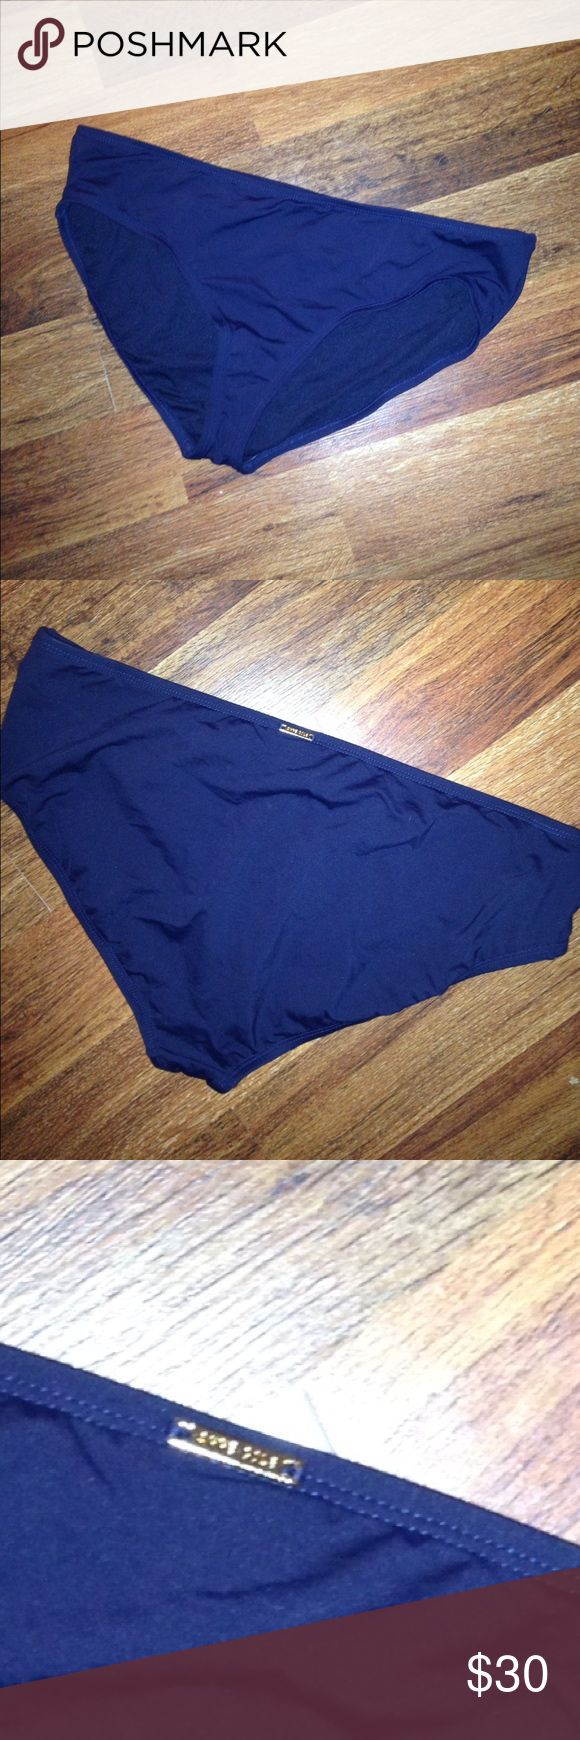 NWOT Ann Cole Navy Blue Bikini Bottoms NWOT NEVER WORN Ann Cole Navy Blue Bikini Bottoms. Classic and timeless! True to size! Anne Cole Swim Bikinis